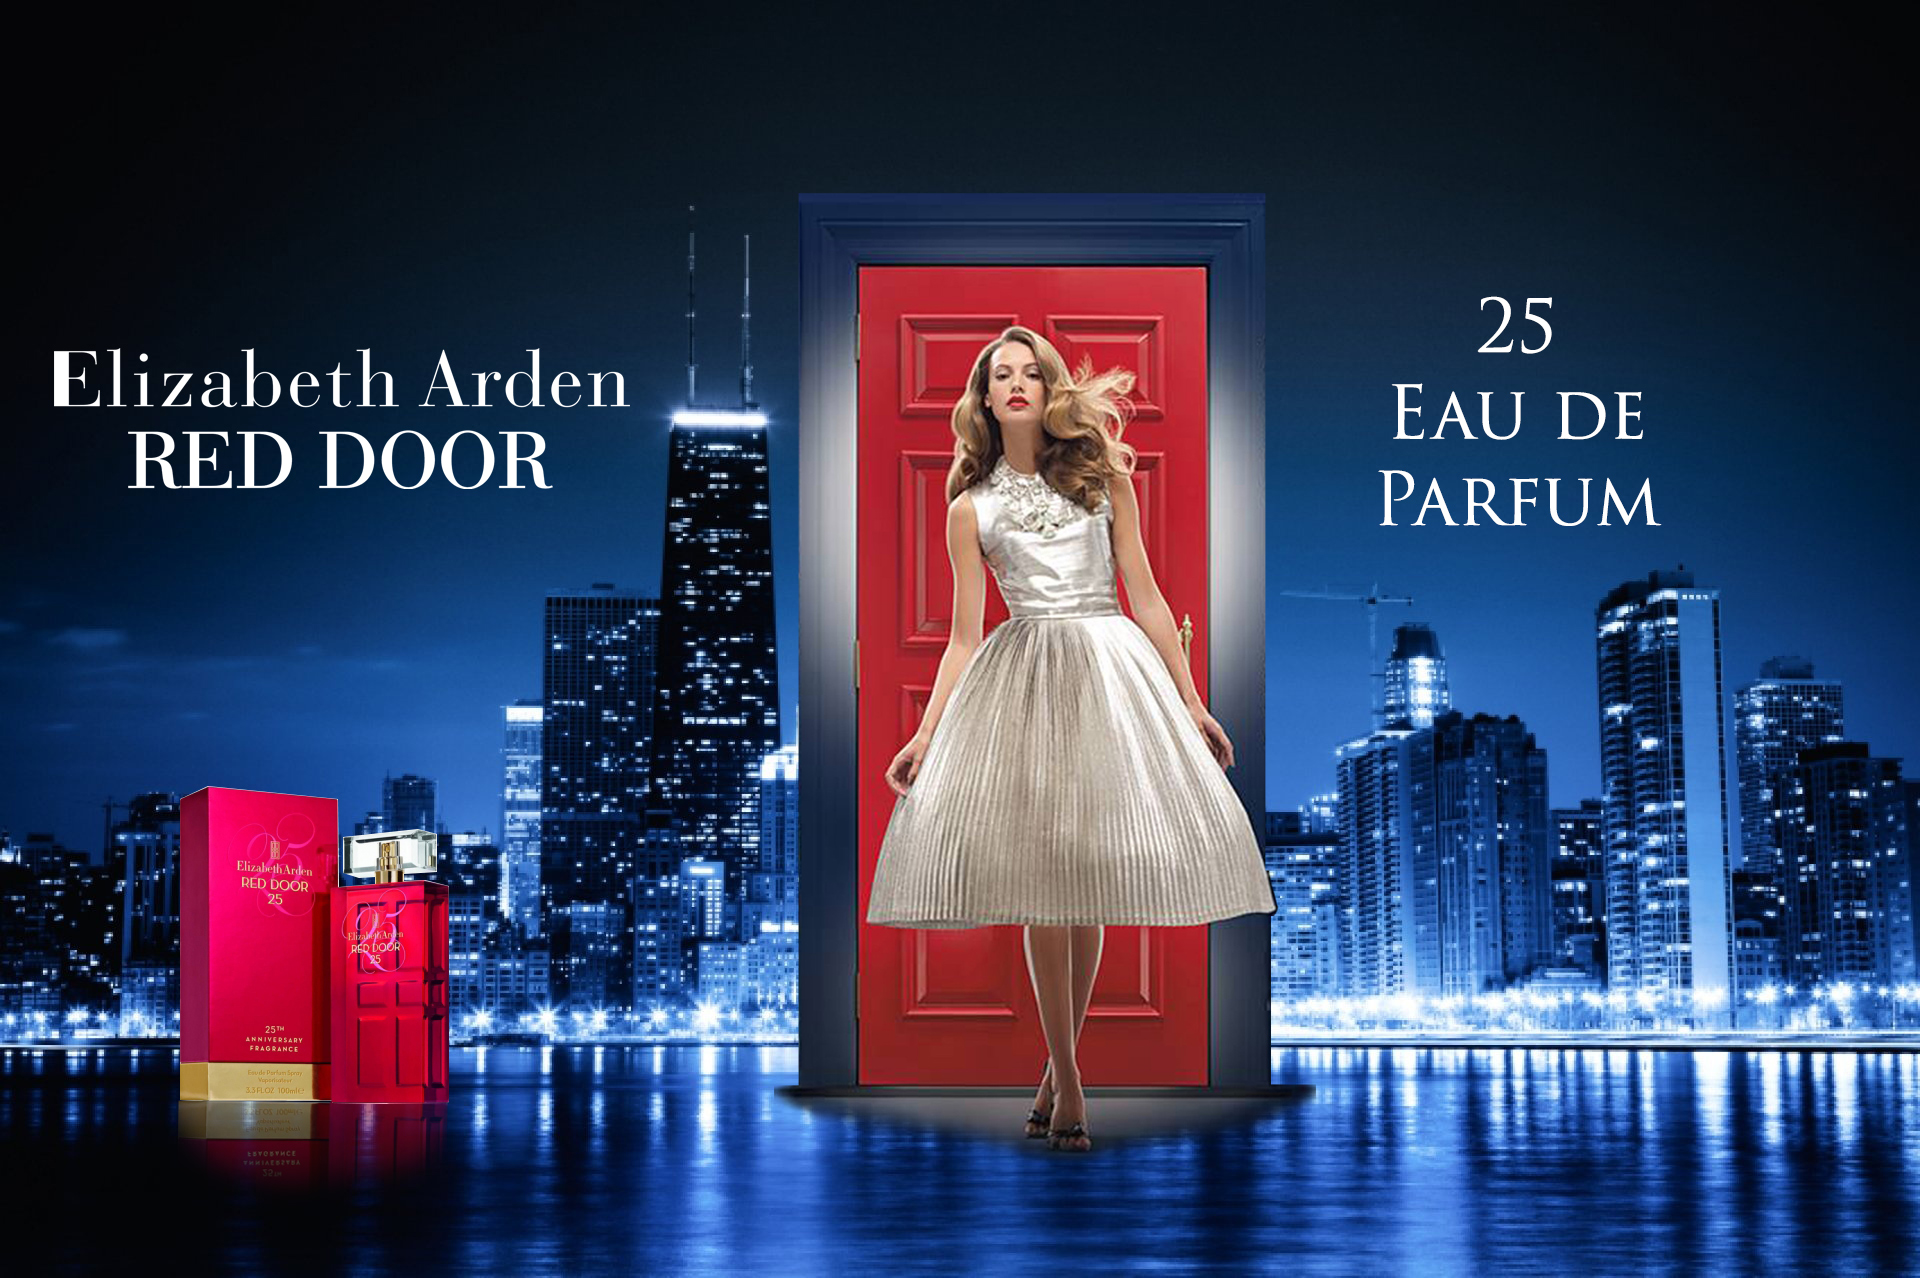 Red Door 25 Eau De Parfum Elizabeth Arden Perfume A Fragrance For